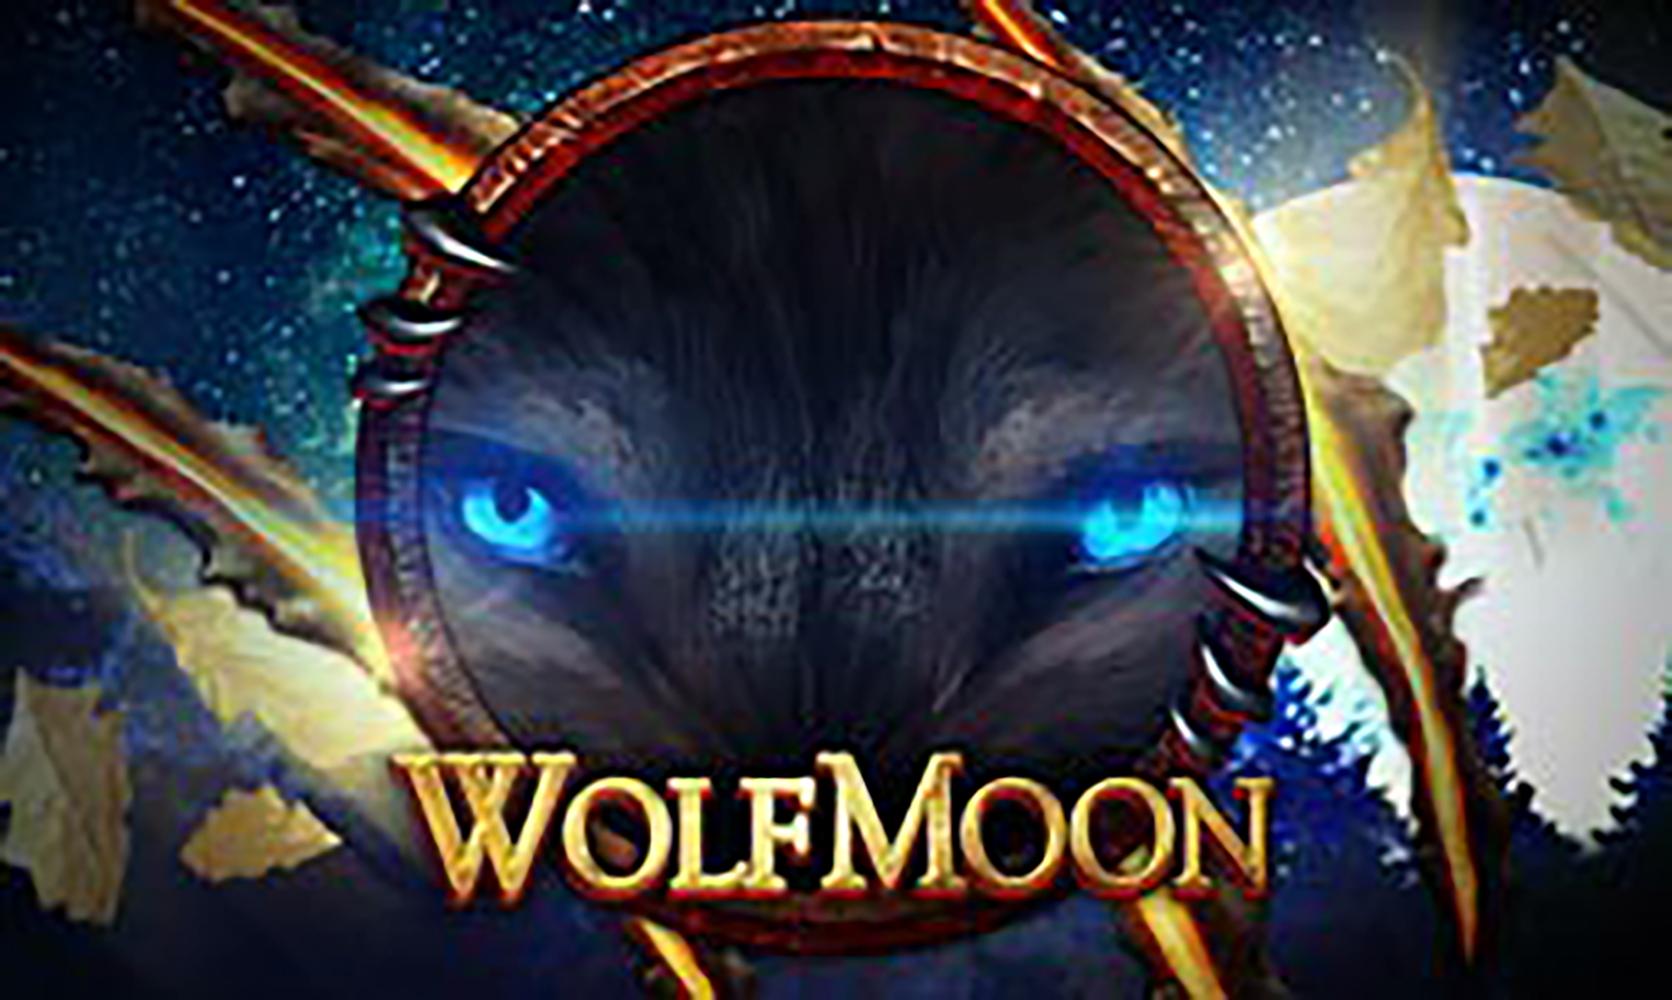 cq9-wolfmoon